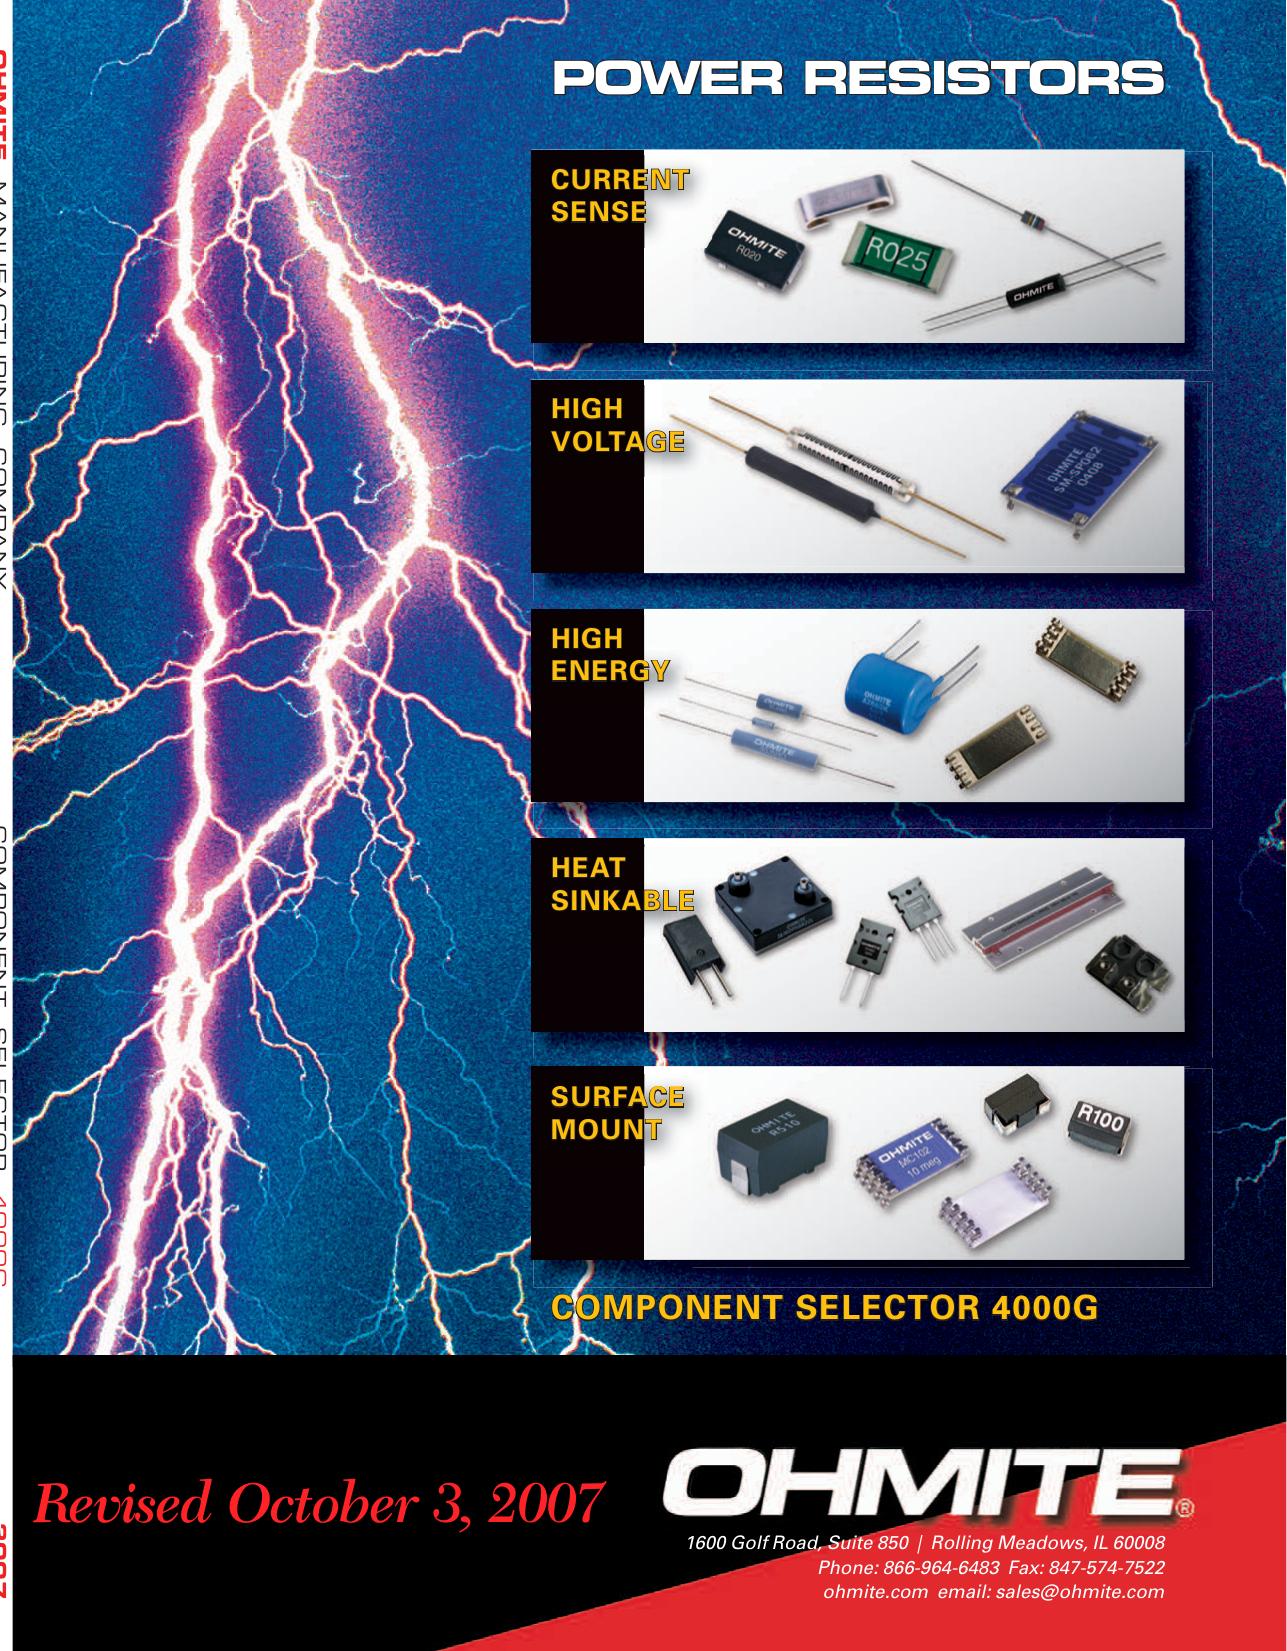 Ohmite Brown Devil 5 Watt Wirewound Power Resistor 25K Ohm Single Piece